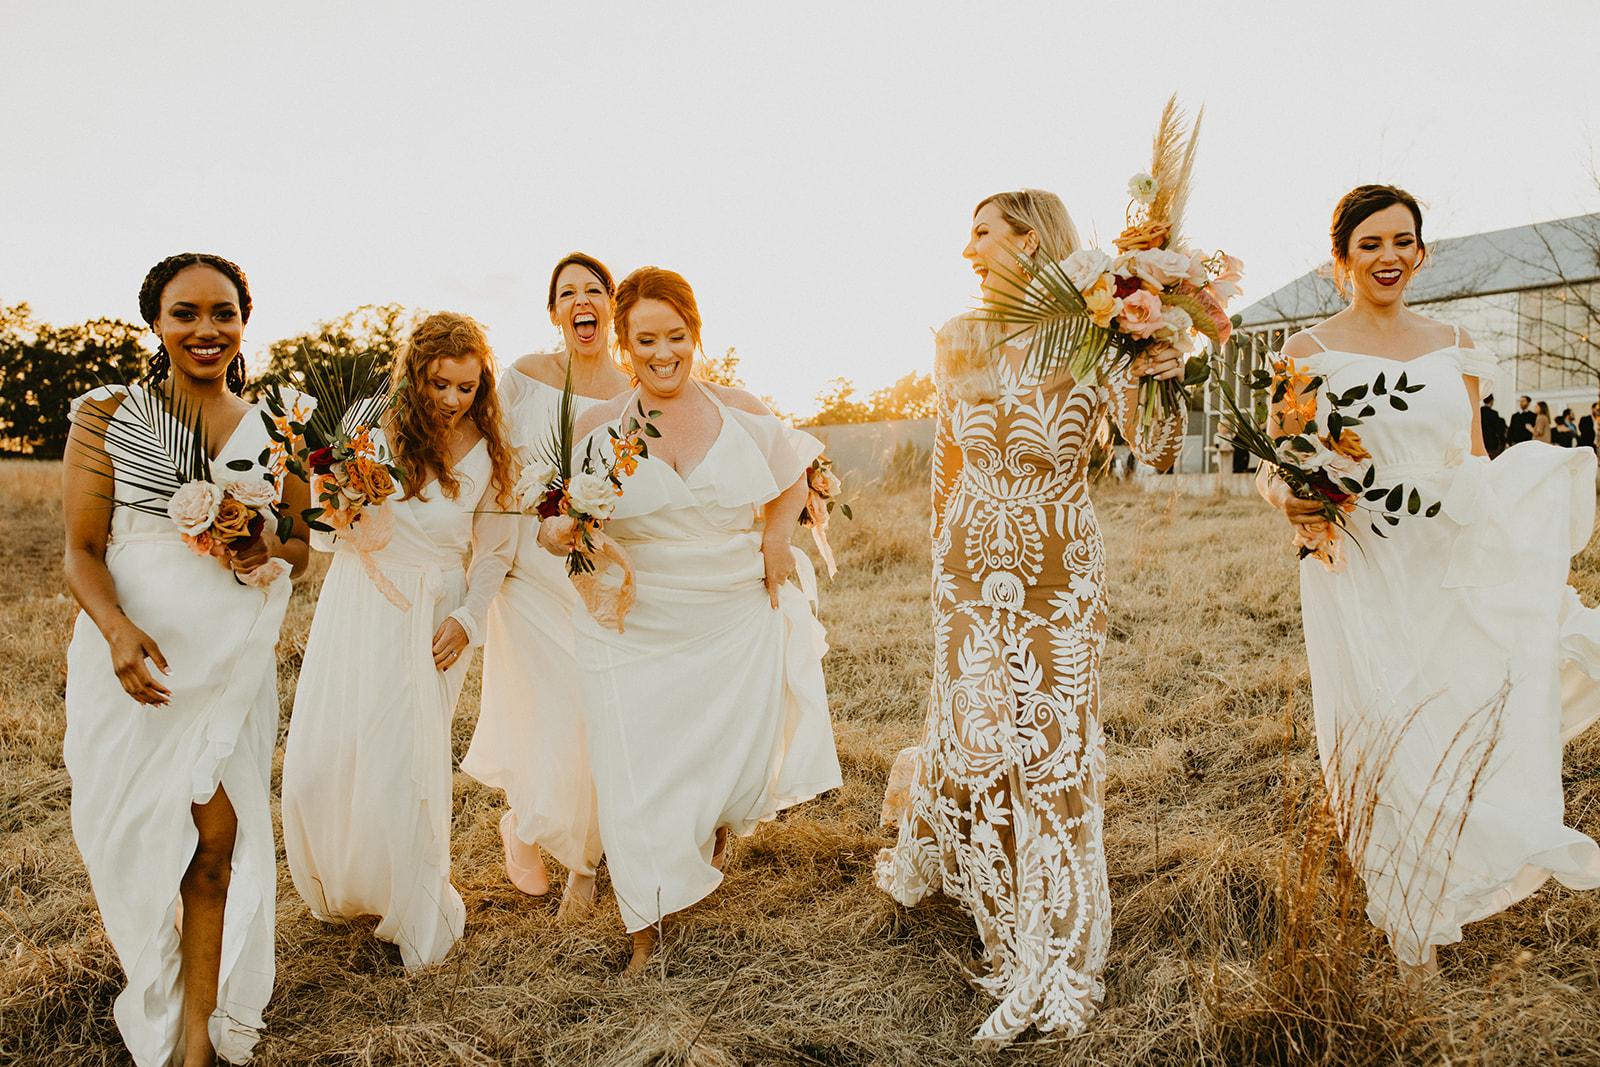 Tropical Colorful Frond Bridesmaid + Bride Bouquets + White Creamy Bridesmaid Dresses + Rue De Seine Wedding Dress + Boho Wedding + Dallas Wedding Florist Tersilla + wedding party pictures